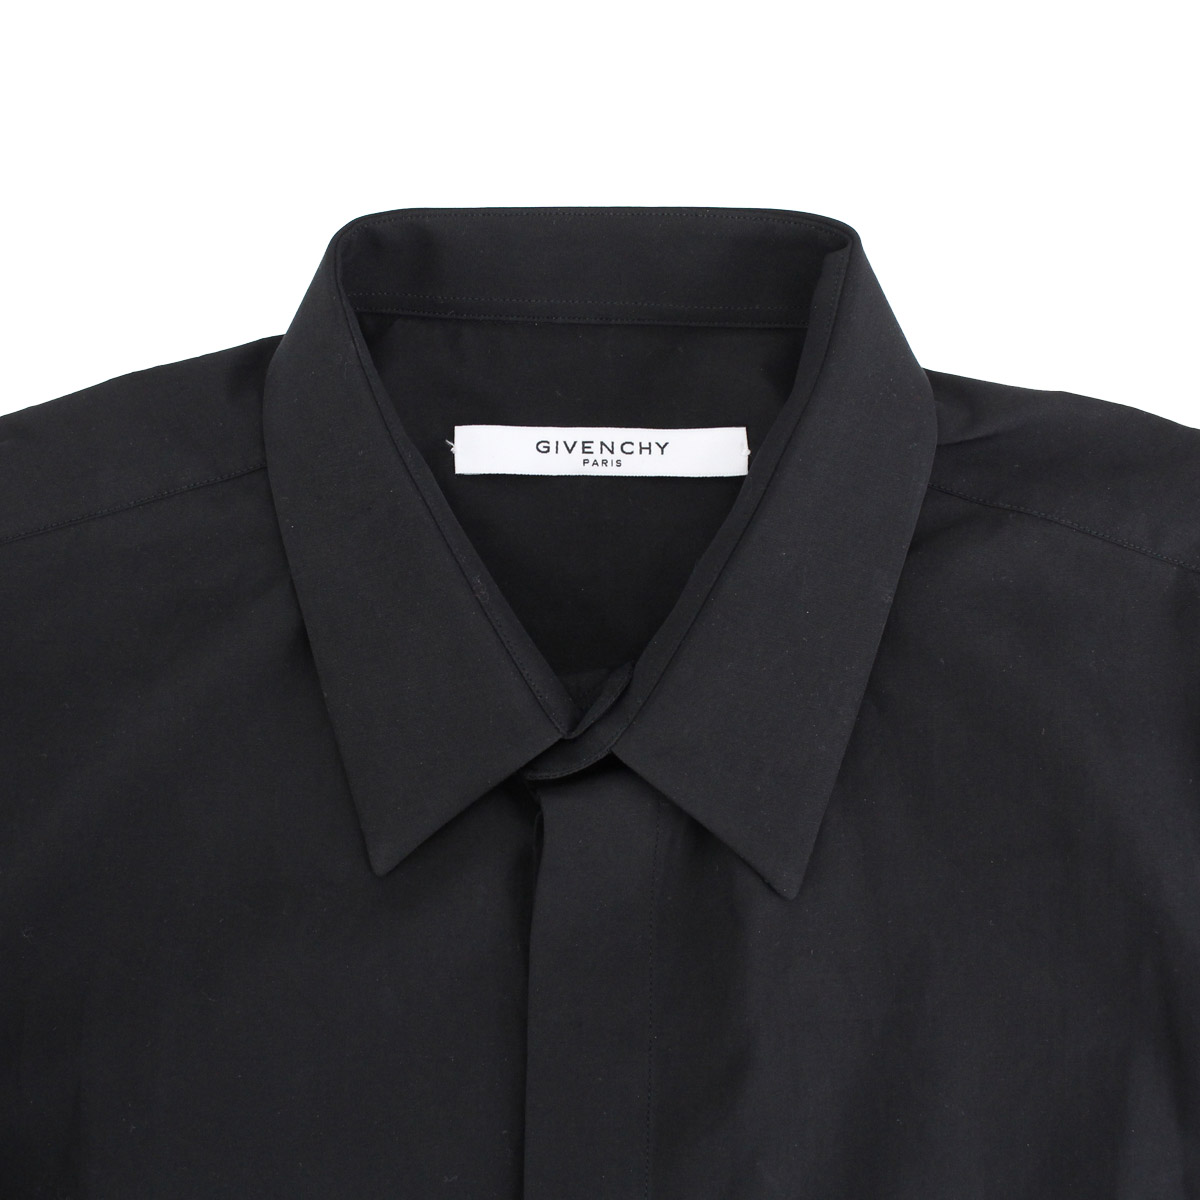 Very Bighit The total brand wholesale   Rakuten Global Market: Givenchy  AU48